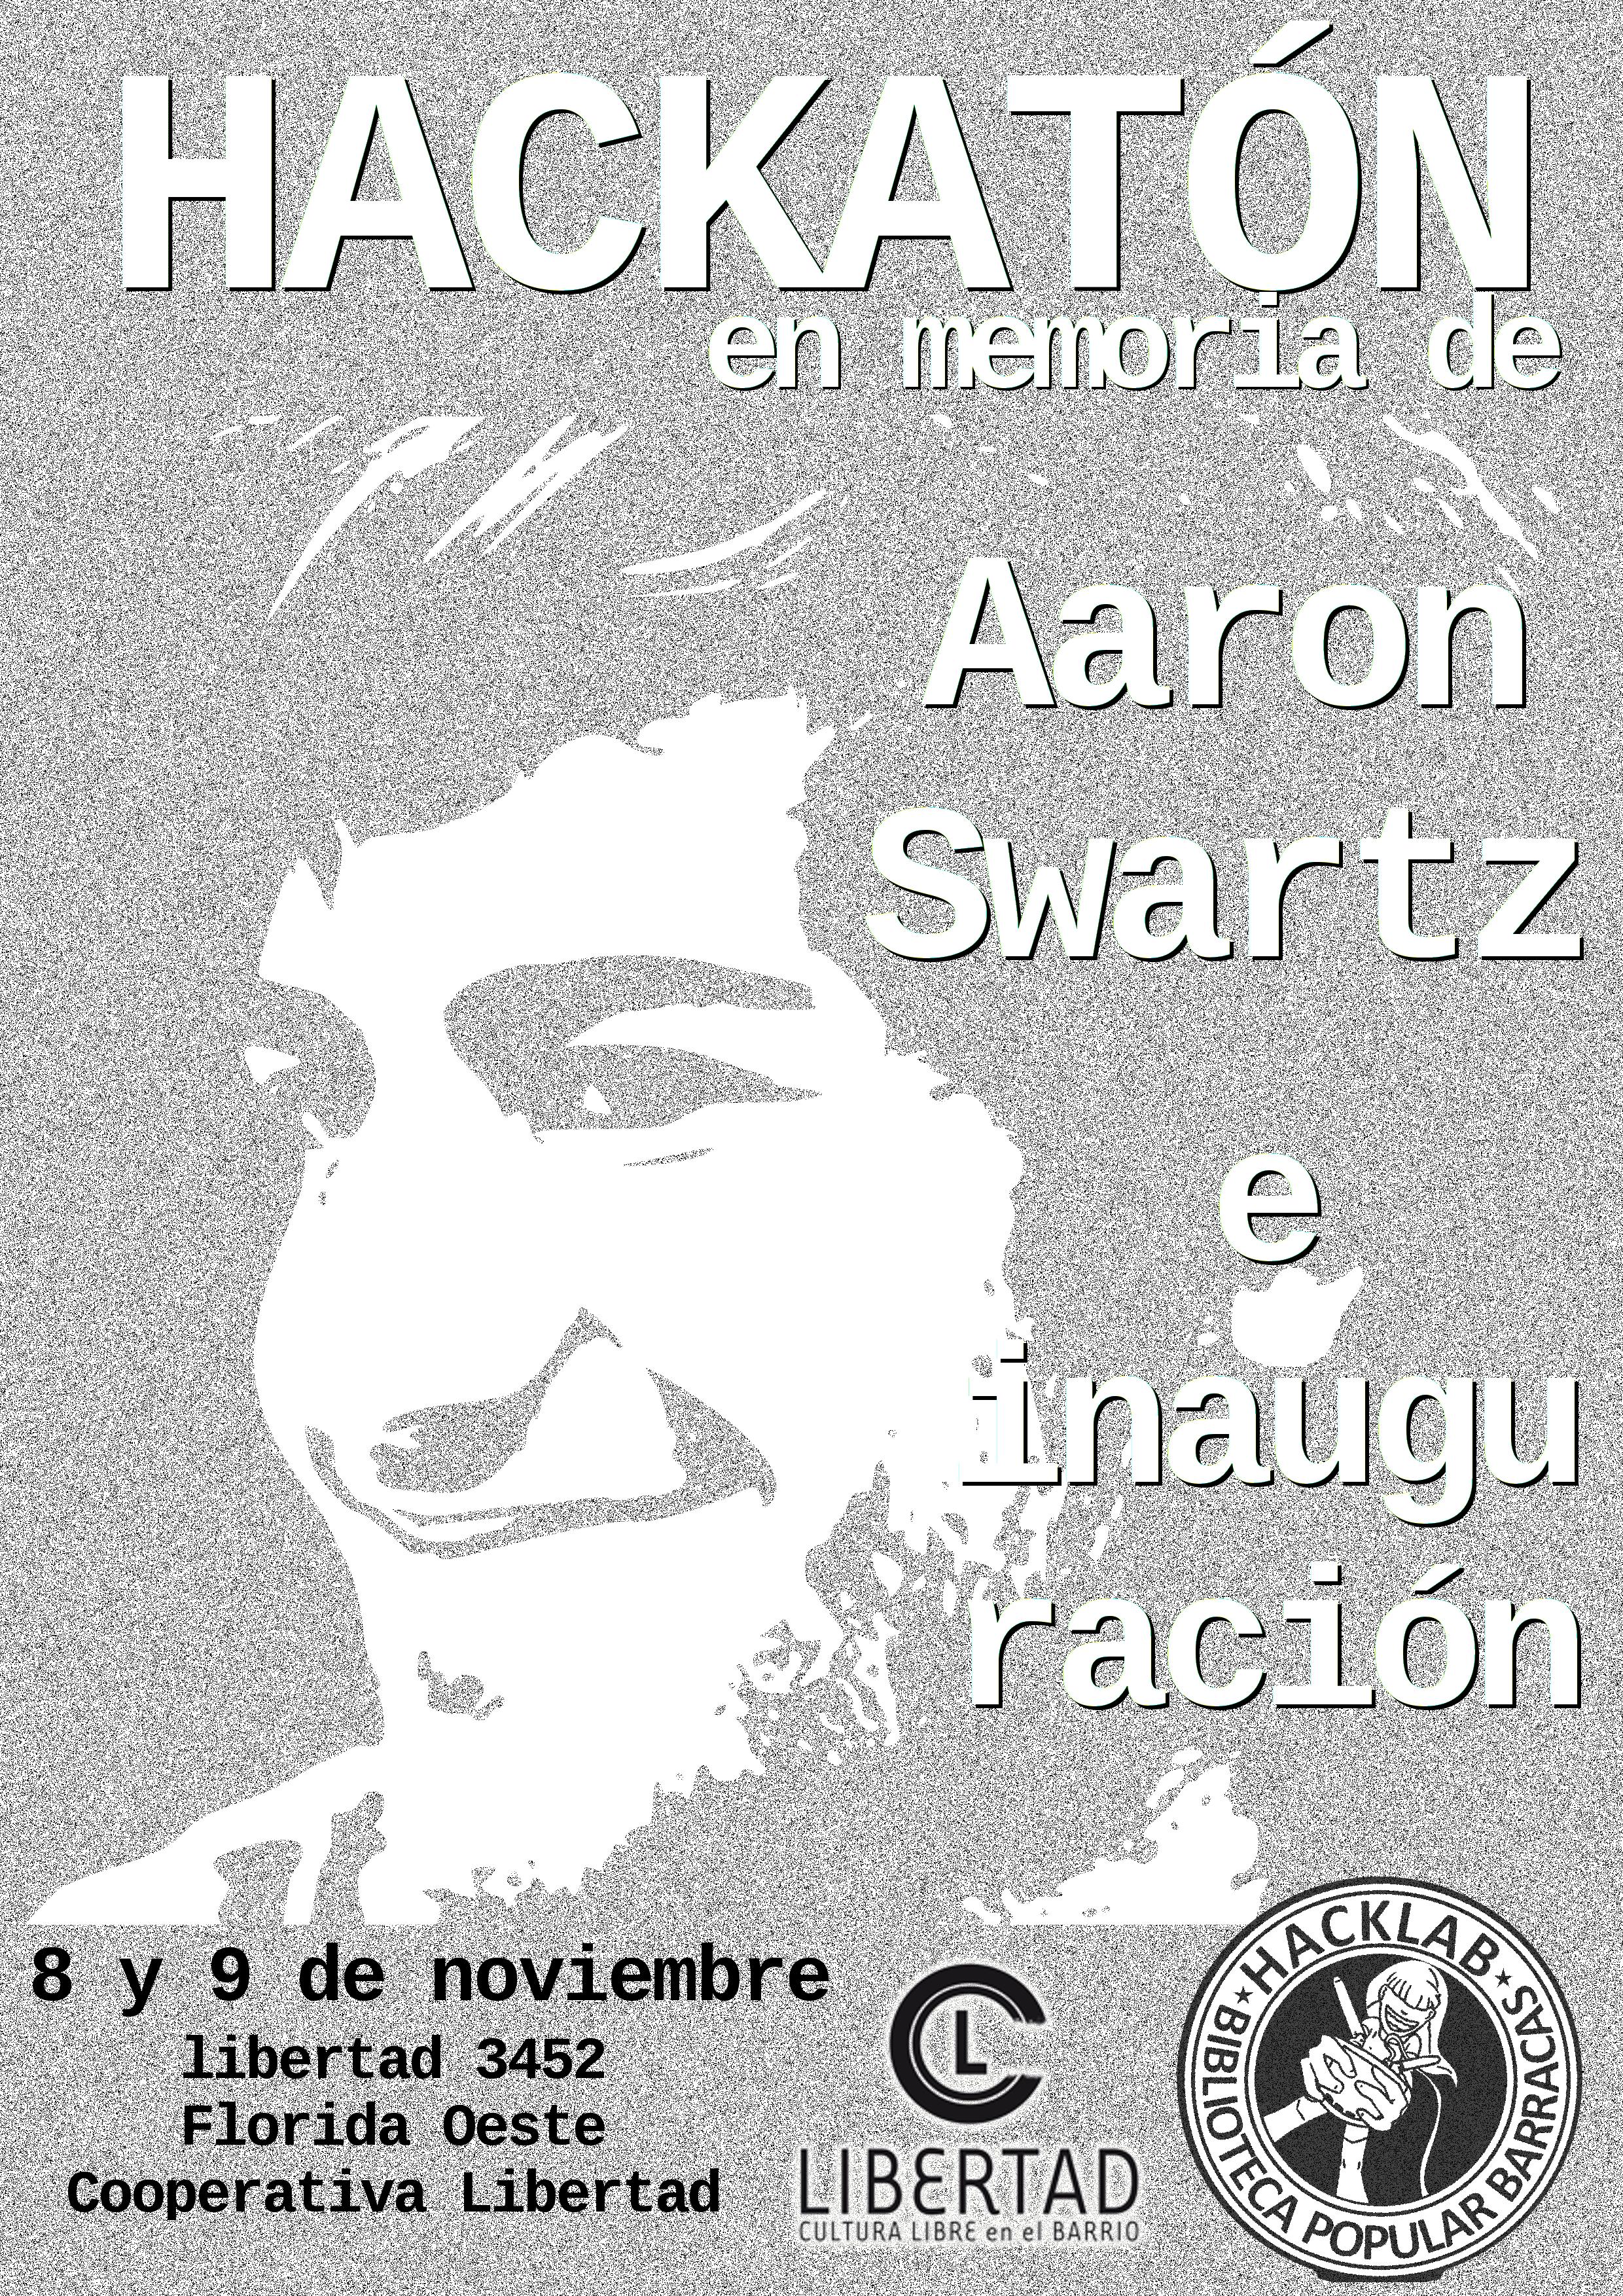 http://esfriki.com/f/poster-2.png